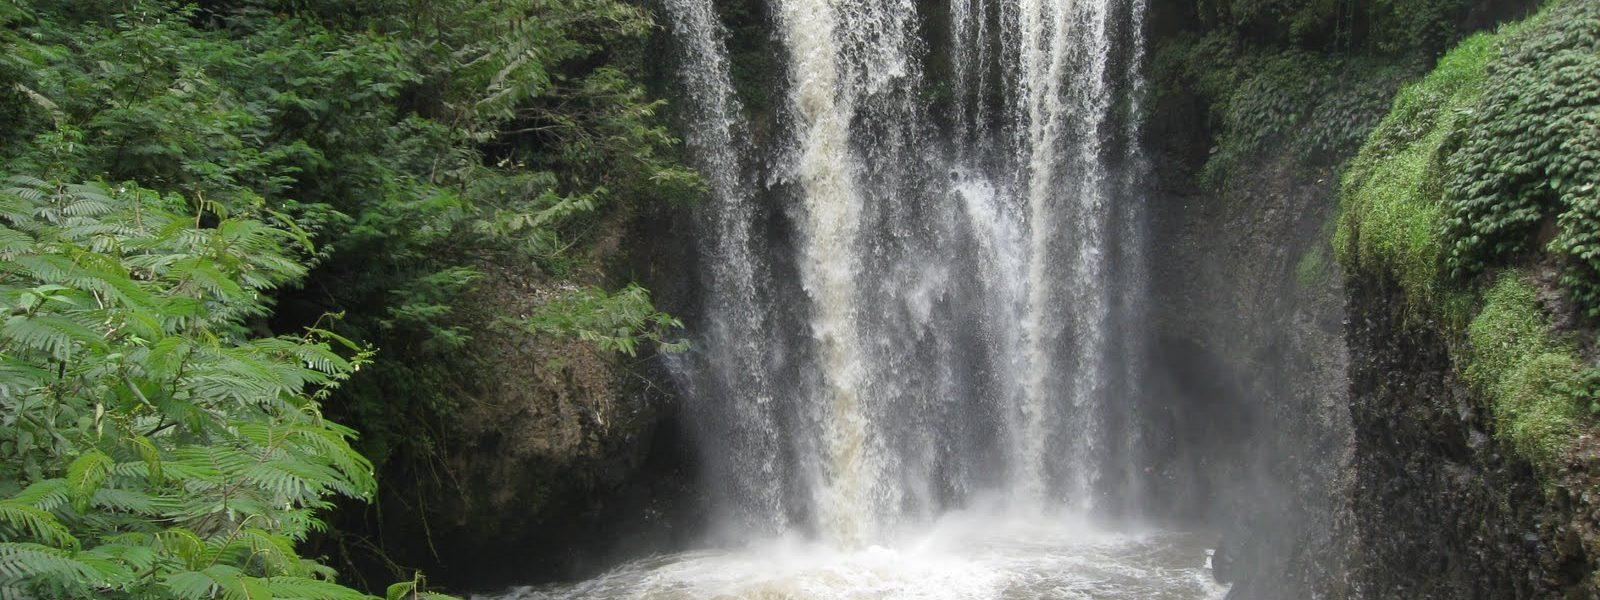 Air terjun Maribaya Bandung